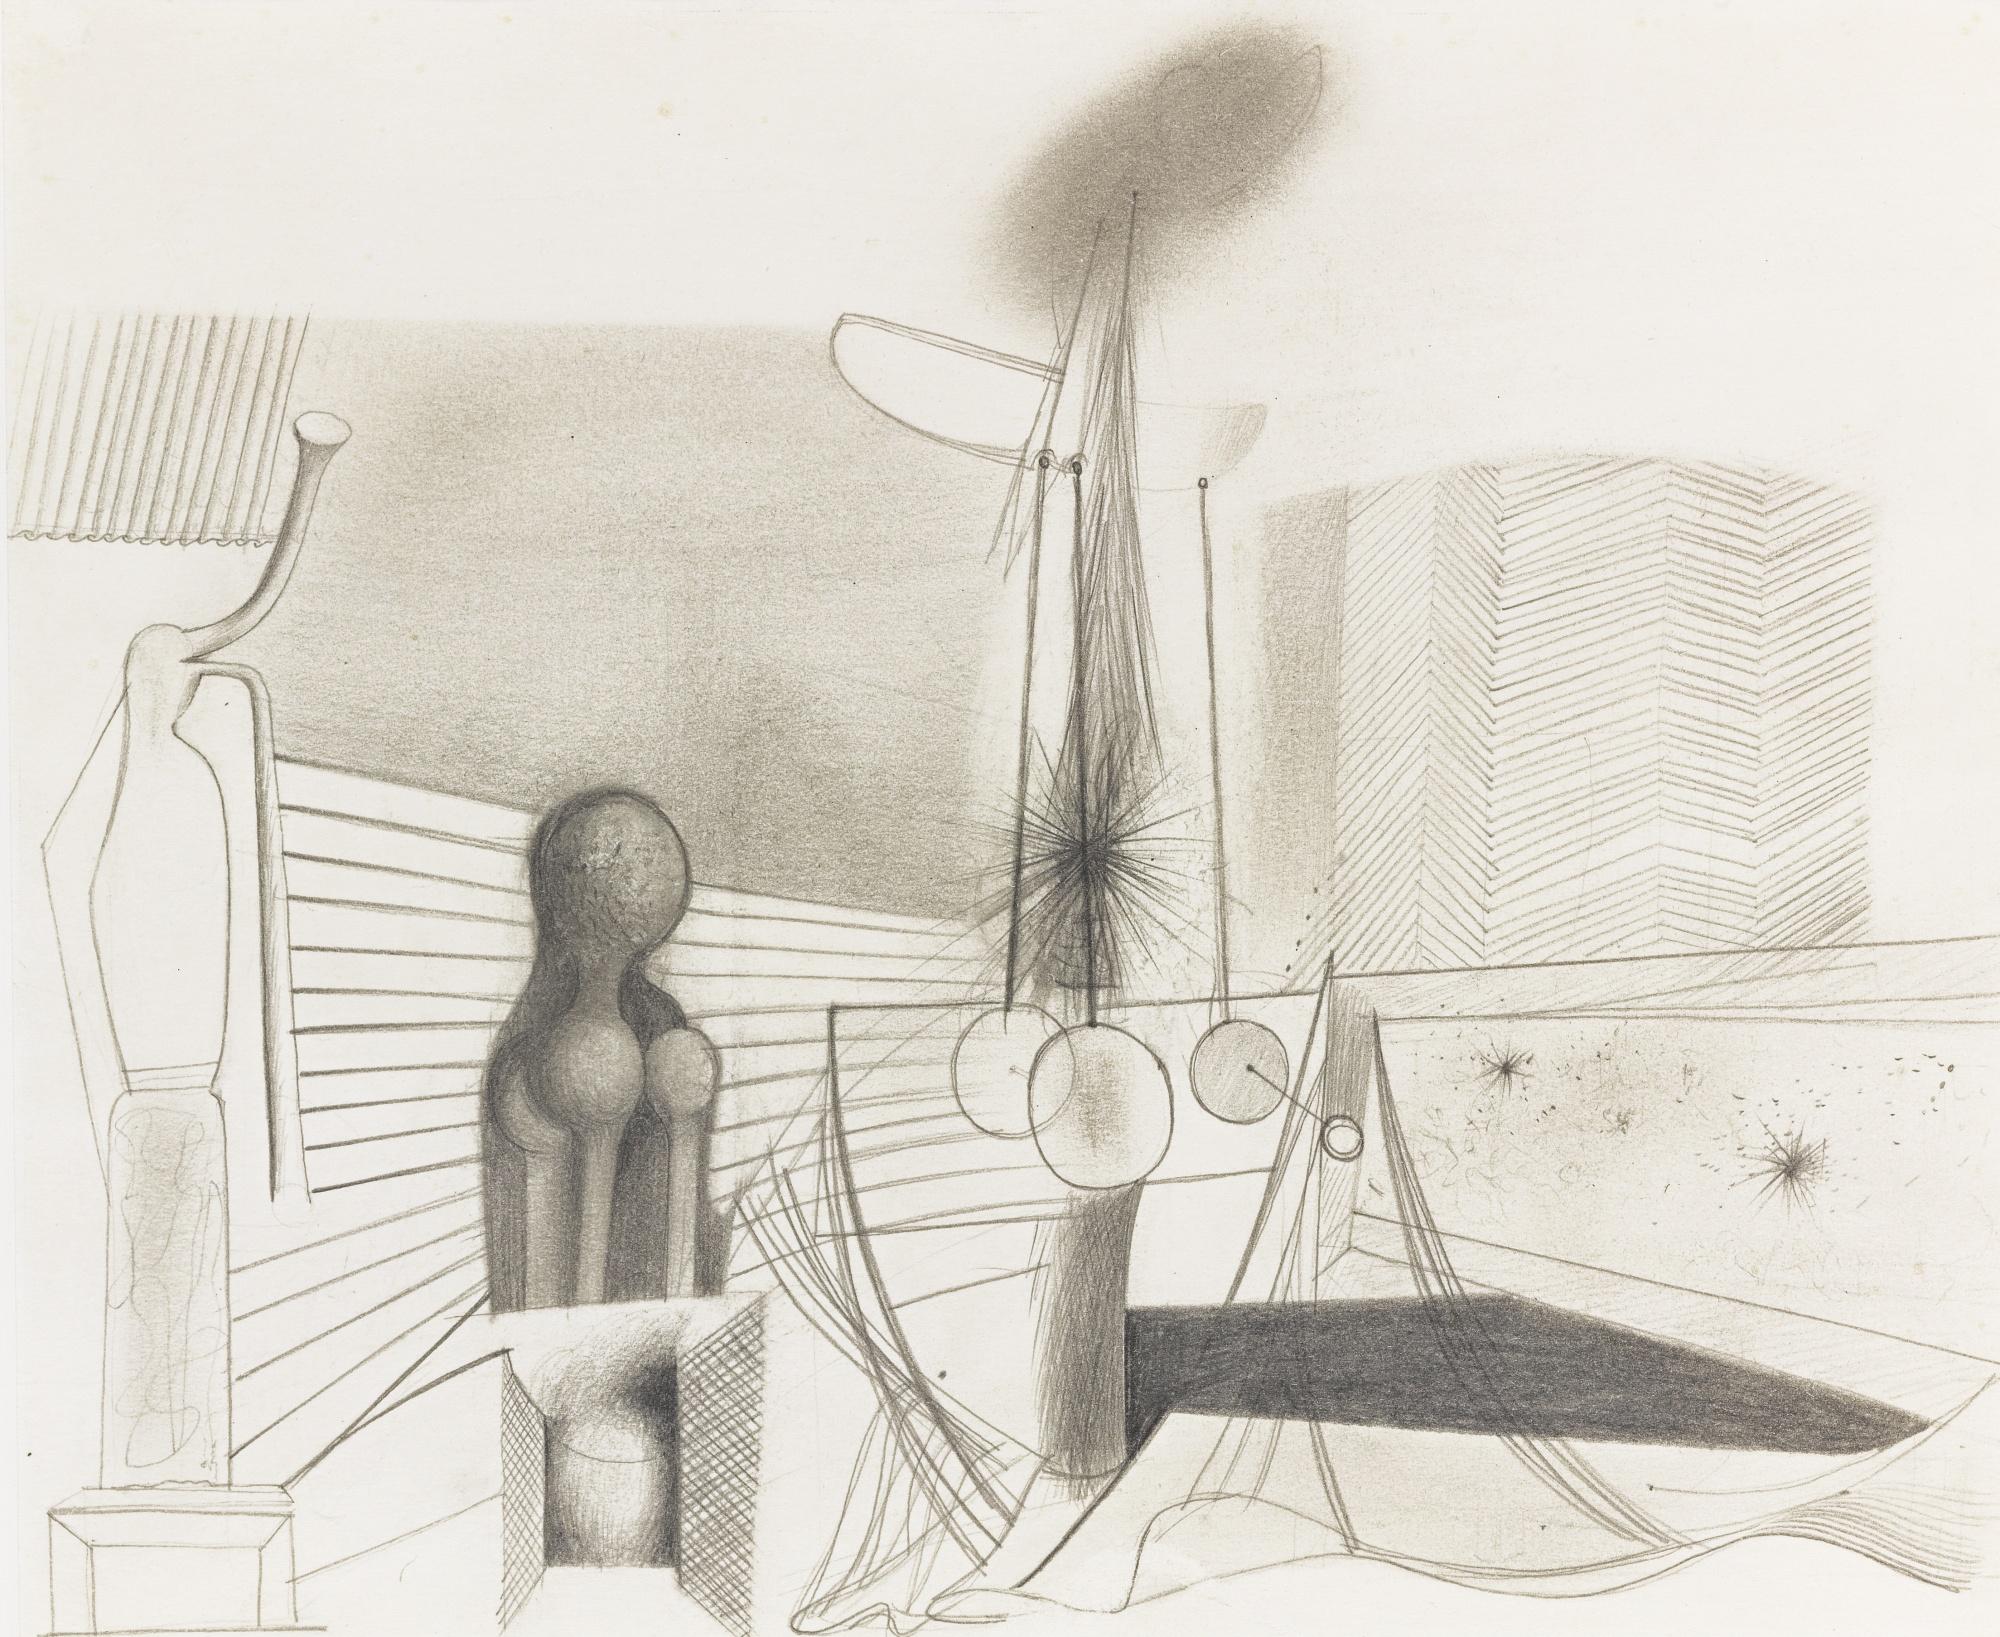 Willem de Kooning-Untitled (Study For World's Fair Mural Medicine)-1937